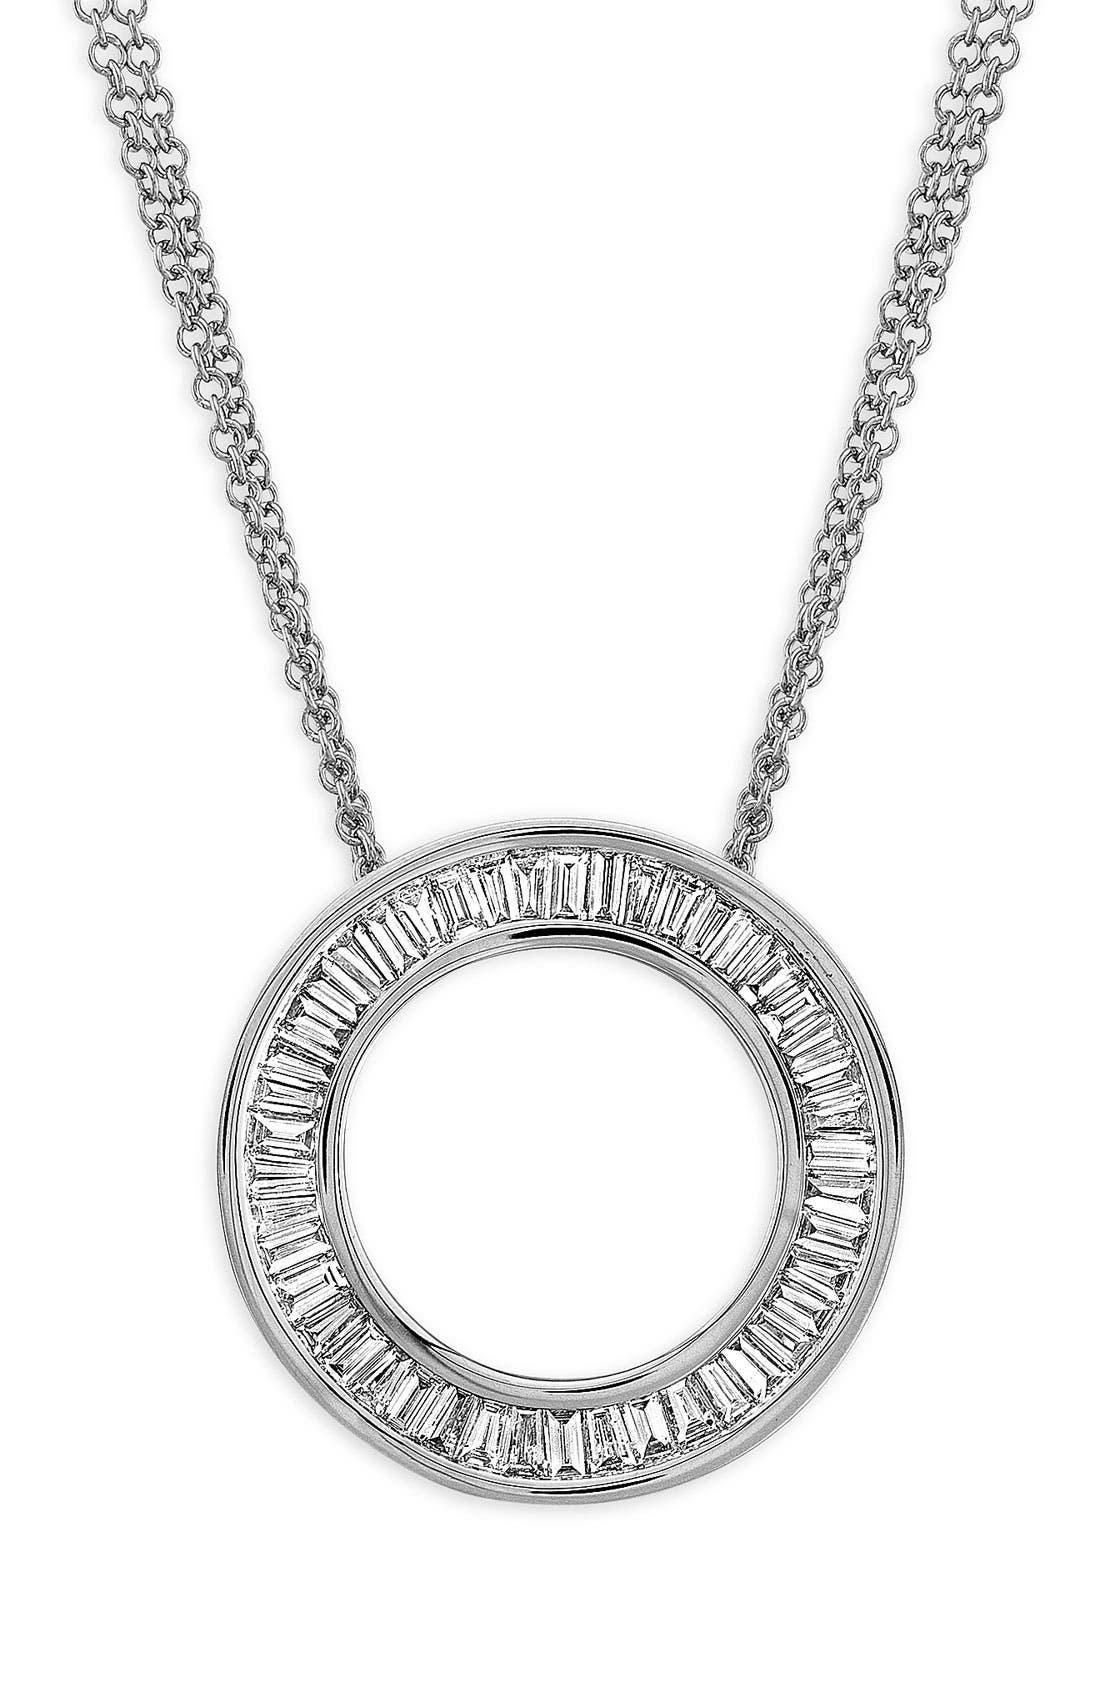 Alternate Image 1 Selected - Bony Levy 'Circle of Life' Medium Diamond Pendant Necklace (Nordstrom Exclusive)